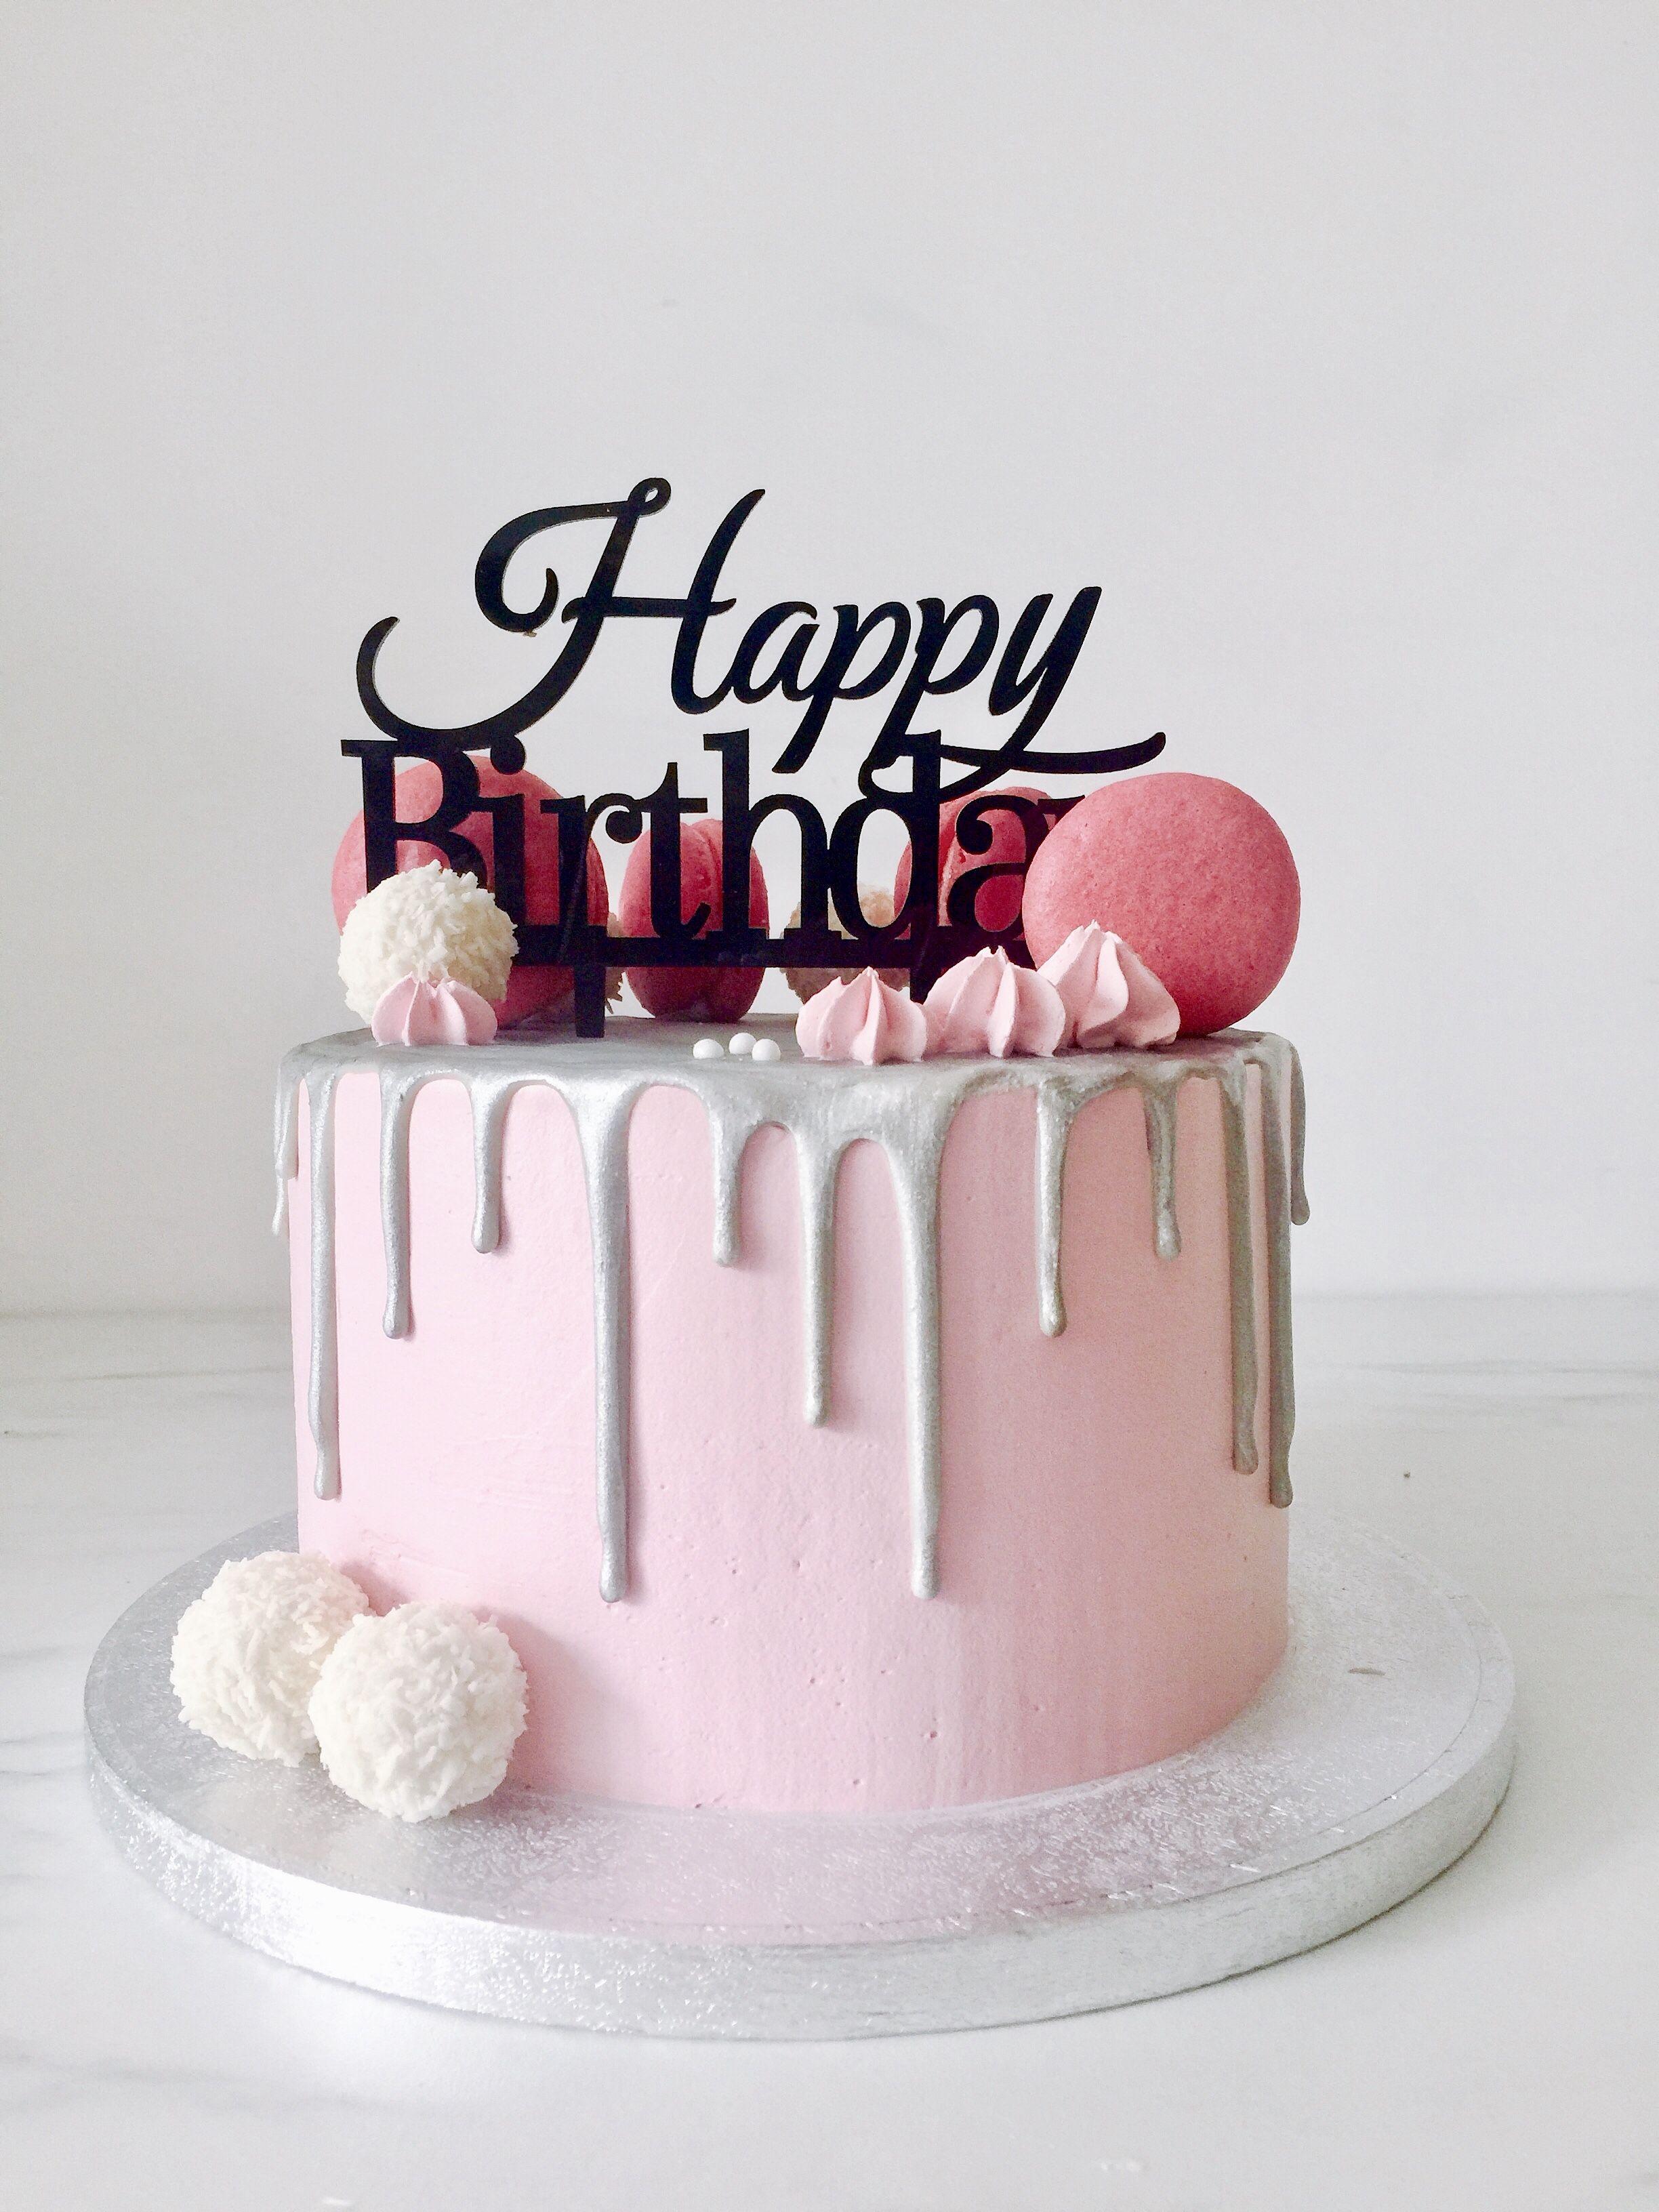 Astonishing Ariana Sweet 16 Birthday Cake Sweet 16 Cakes 40Th Birthday Cakes Funny Birthday Cards Online Kookostrdamsfinfo